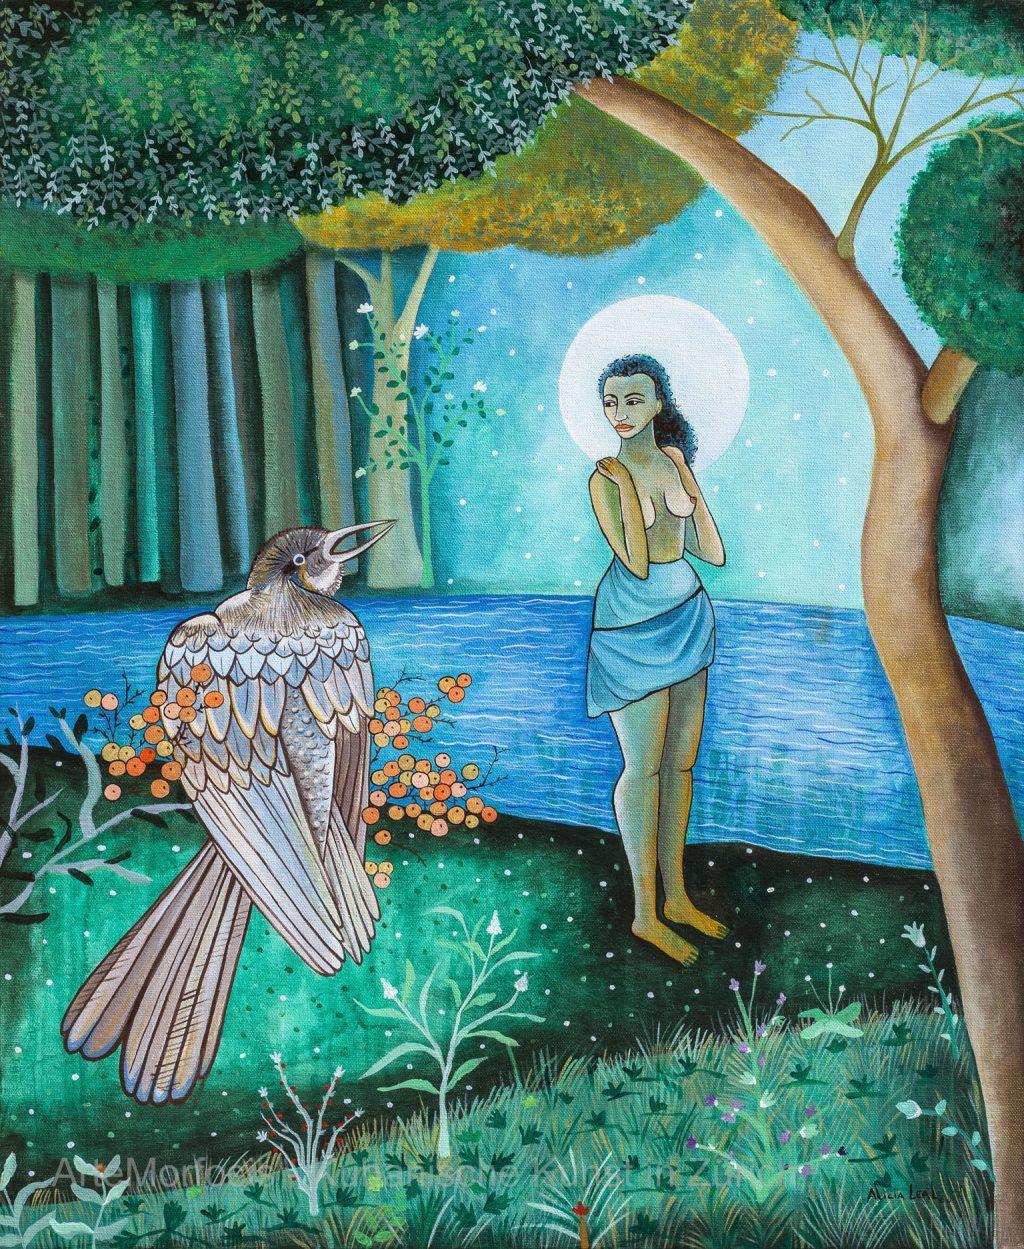 Baño de Luna - Mondbad - 2011 – Acryl auf Leinwand - 72,5 cm x 60,5 cm